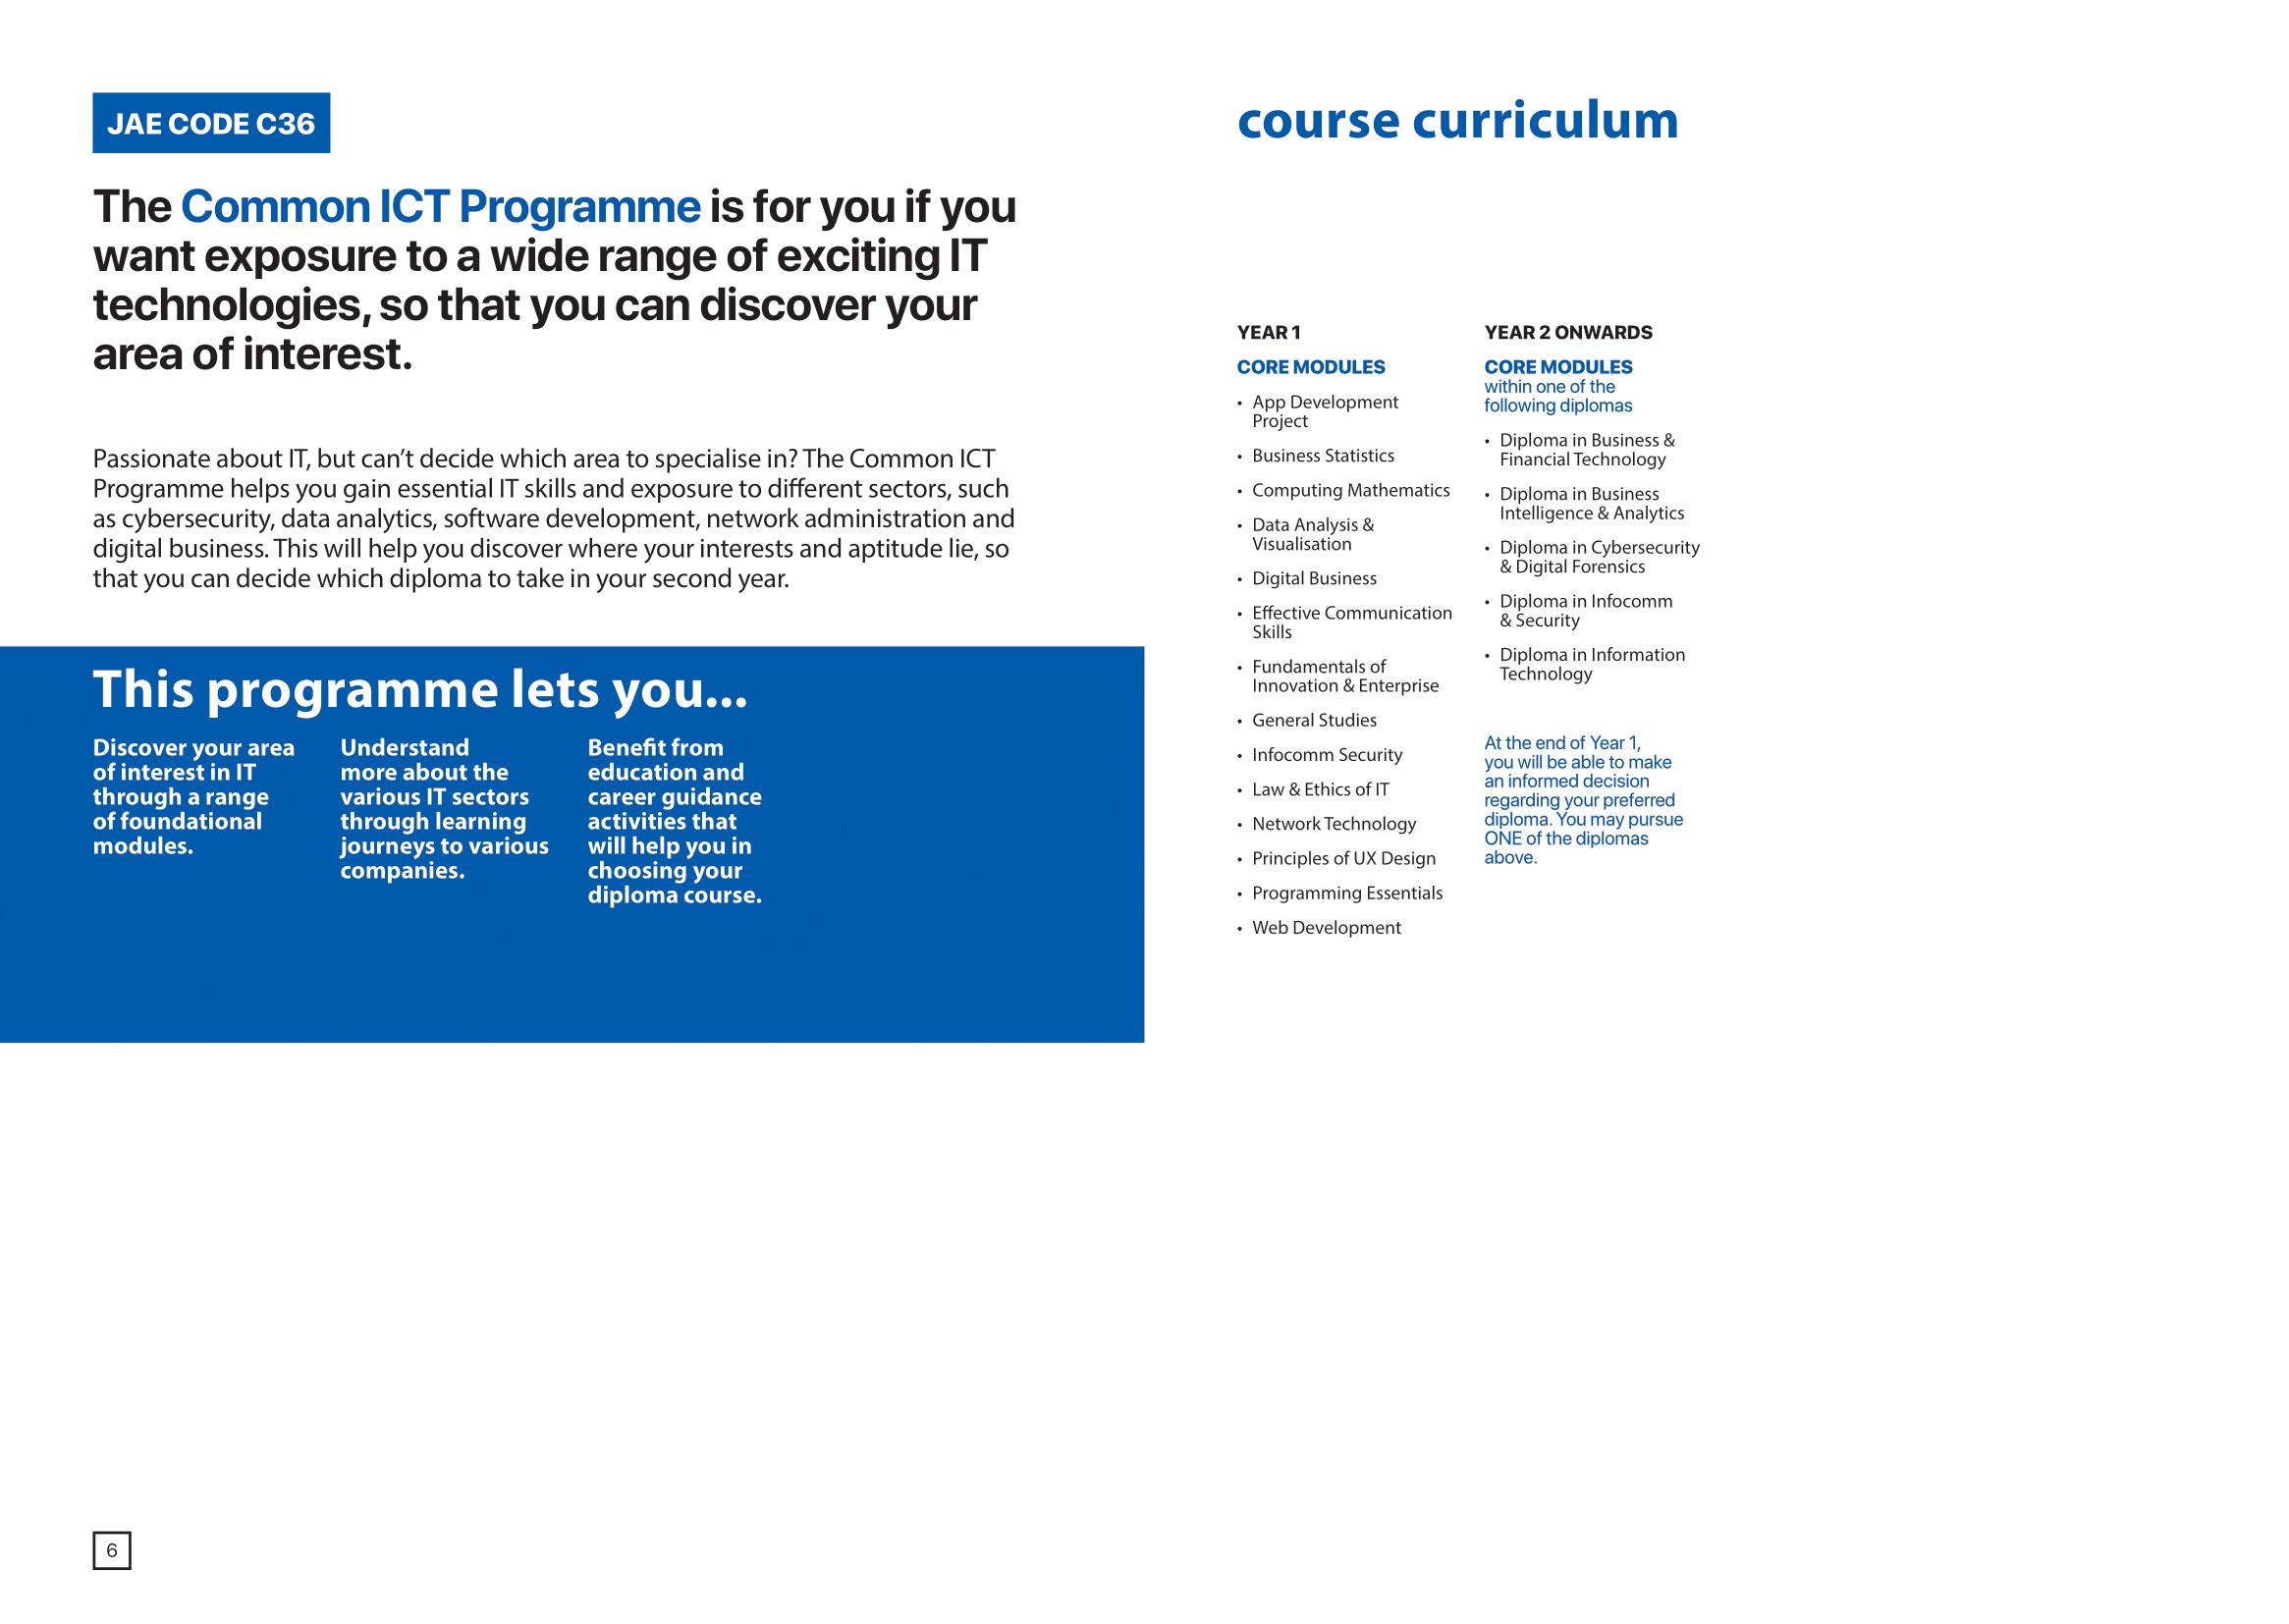 School of Information Technology 2020-05